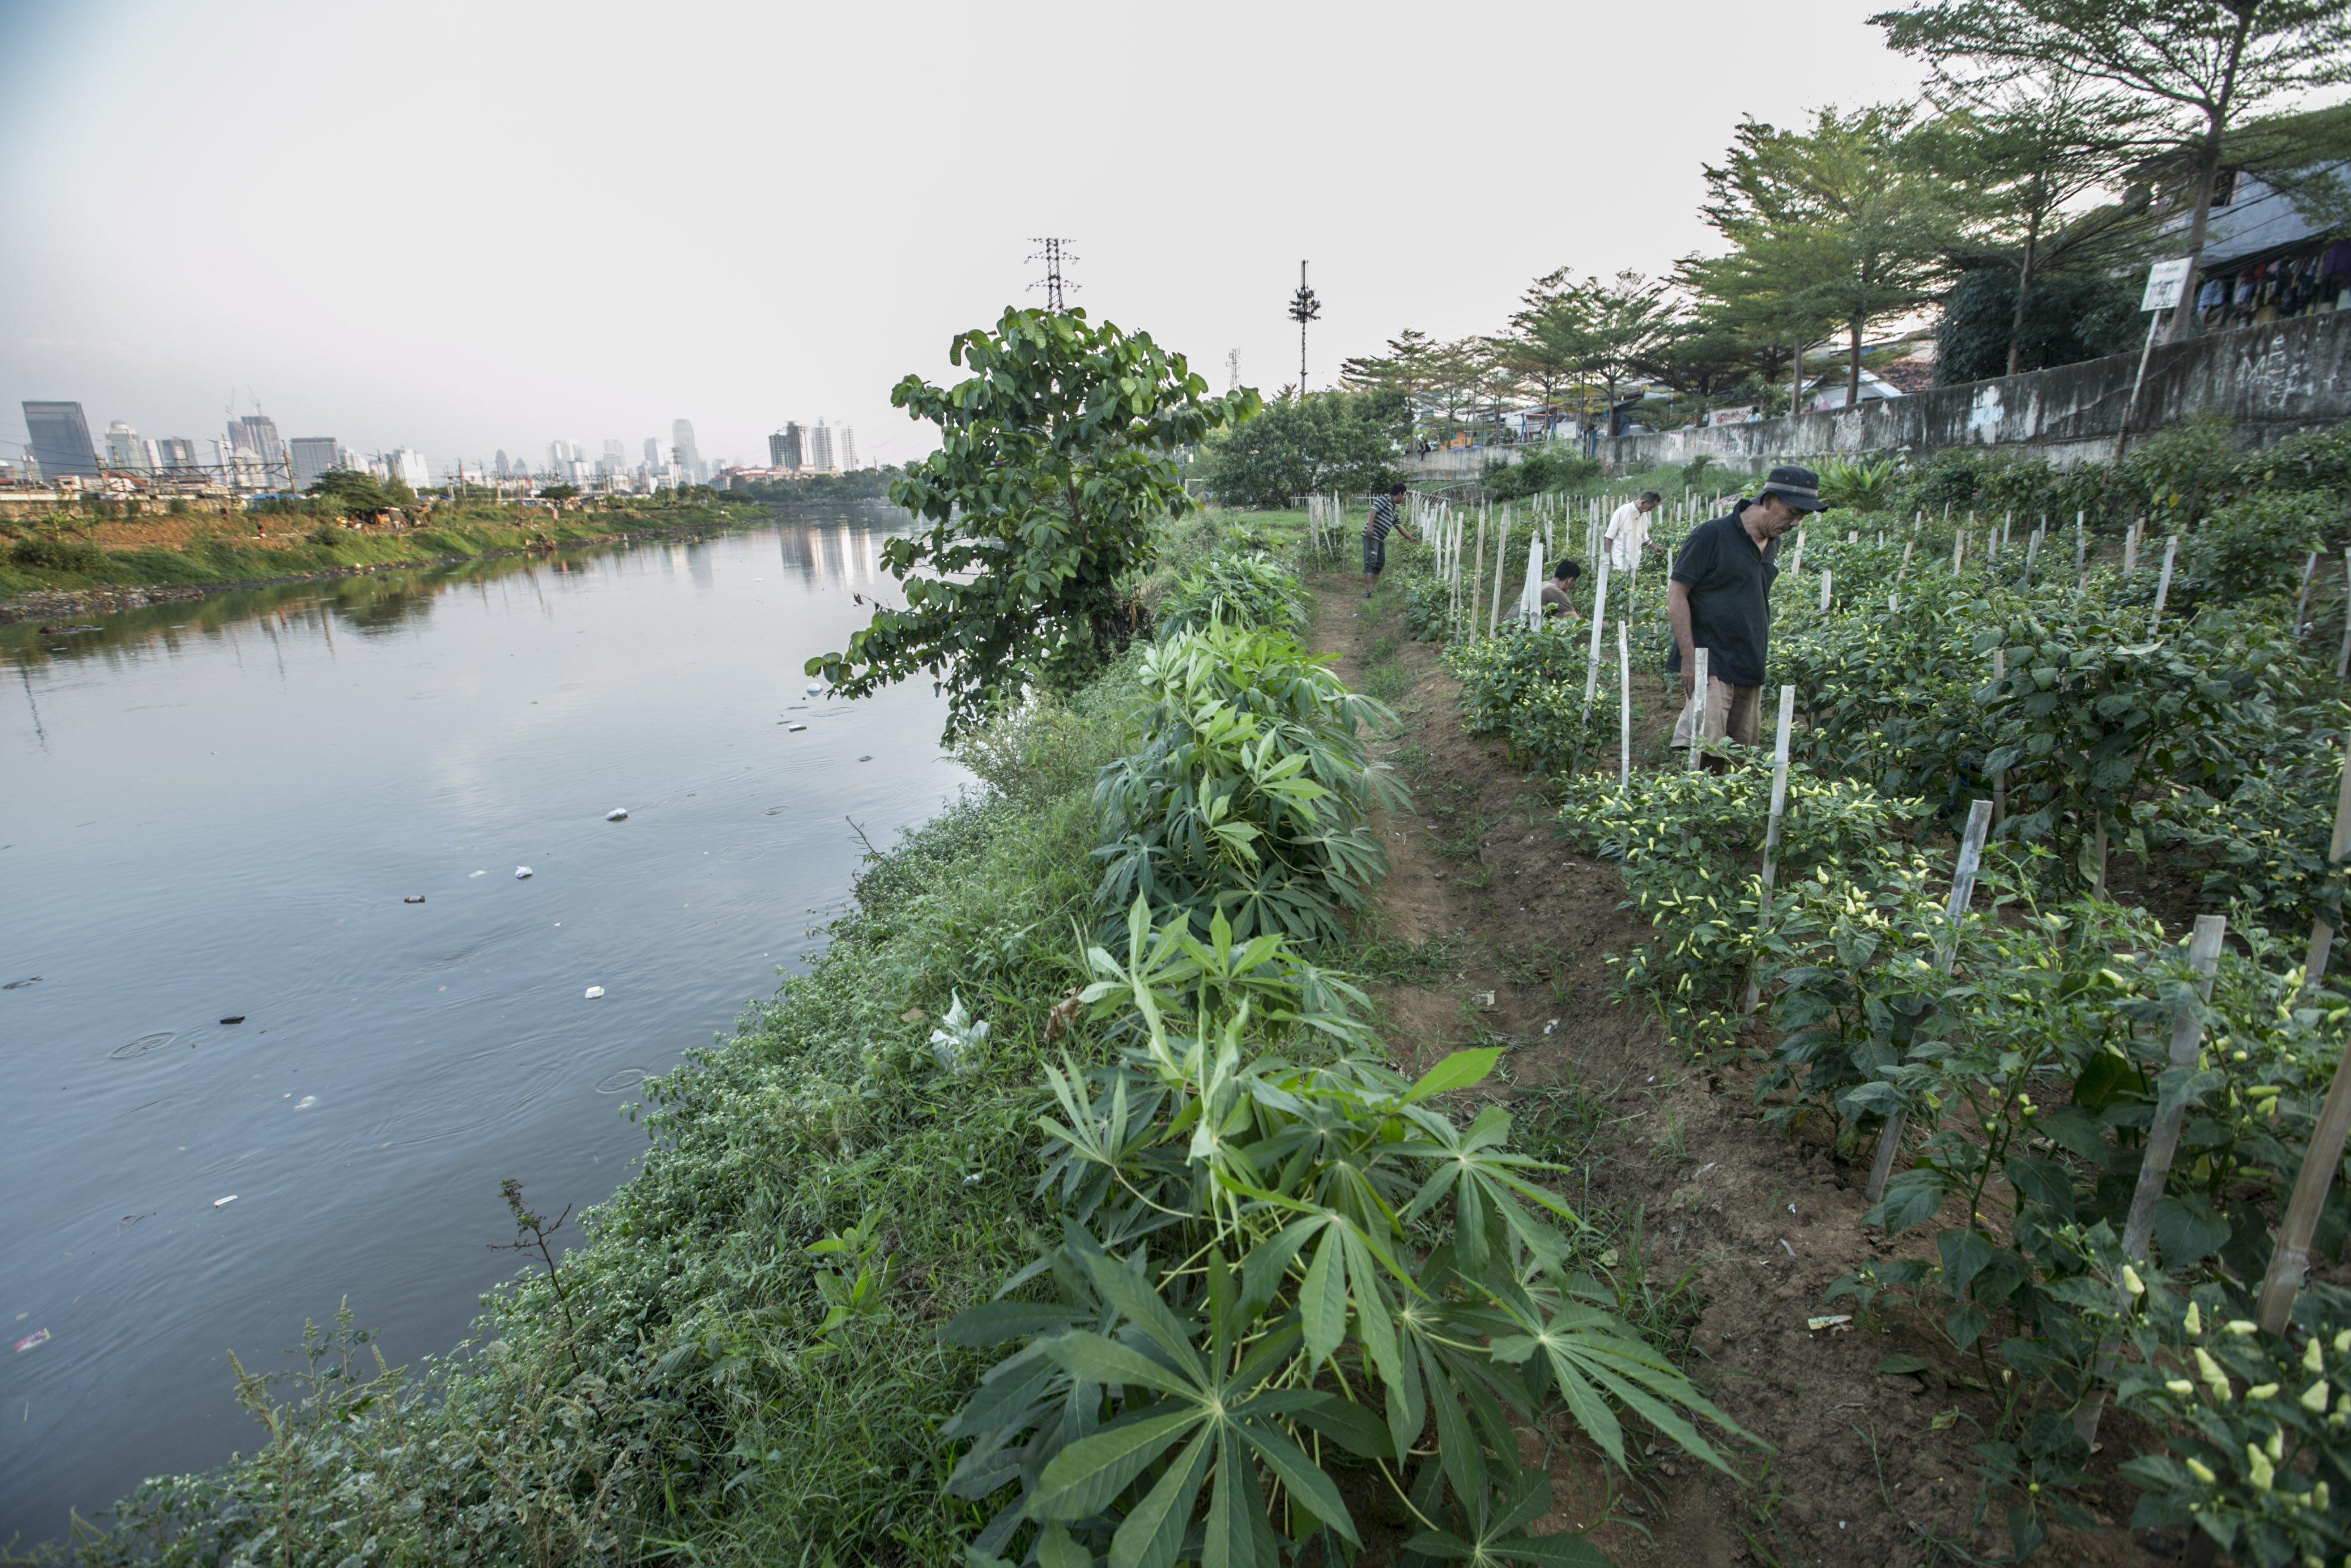 Andi (50) merawat tanaman di bantaran Sungai Ciliwung, Petamburan, Jakarta Pusat, Minggu (12/7/2020). Selama enam tahun ia memanfaatkan lahan bantaran kali Ciliwung untuk bertani bersama kelompok Mandiri Indah Tani sebagai upaya memenuhi kebutuhan hidup diatas keterbatasan lahan dan kemampuan.